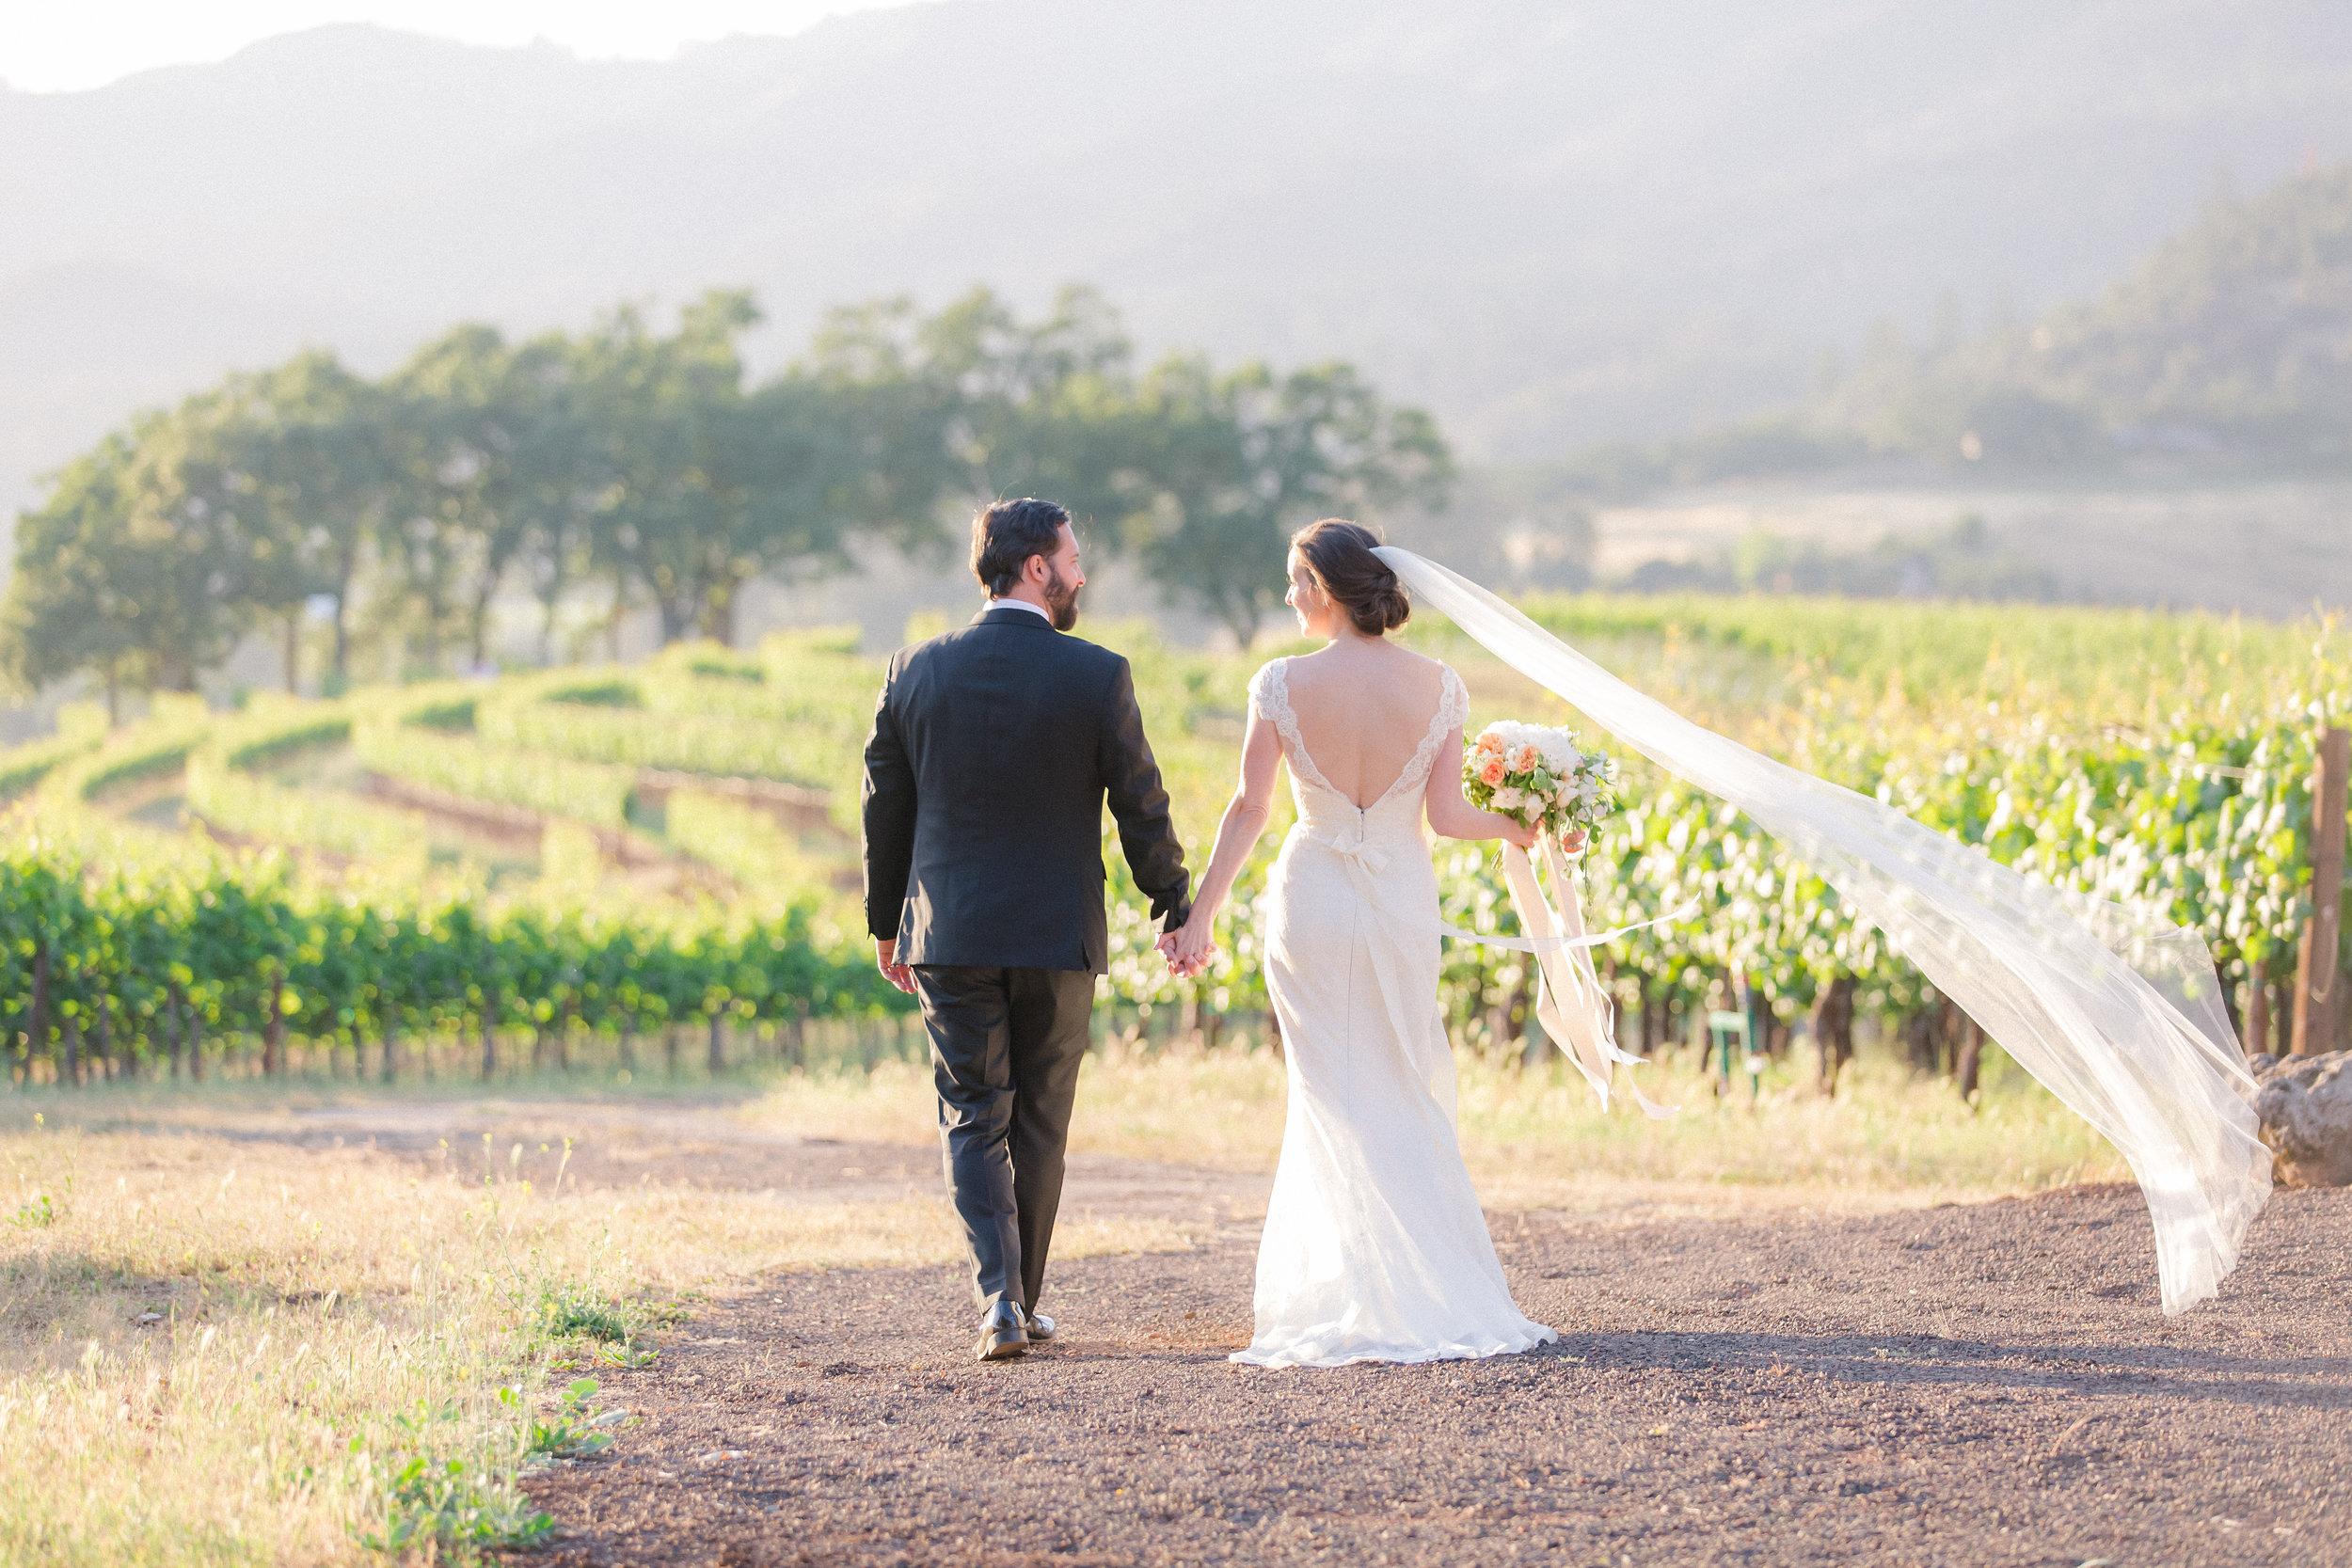 california-wedding-day-lrelyea-events-lori-paladino-photography6.jpg